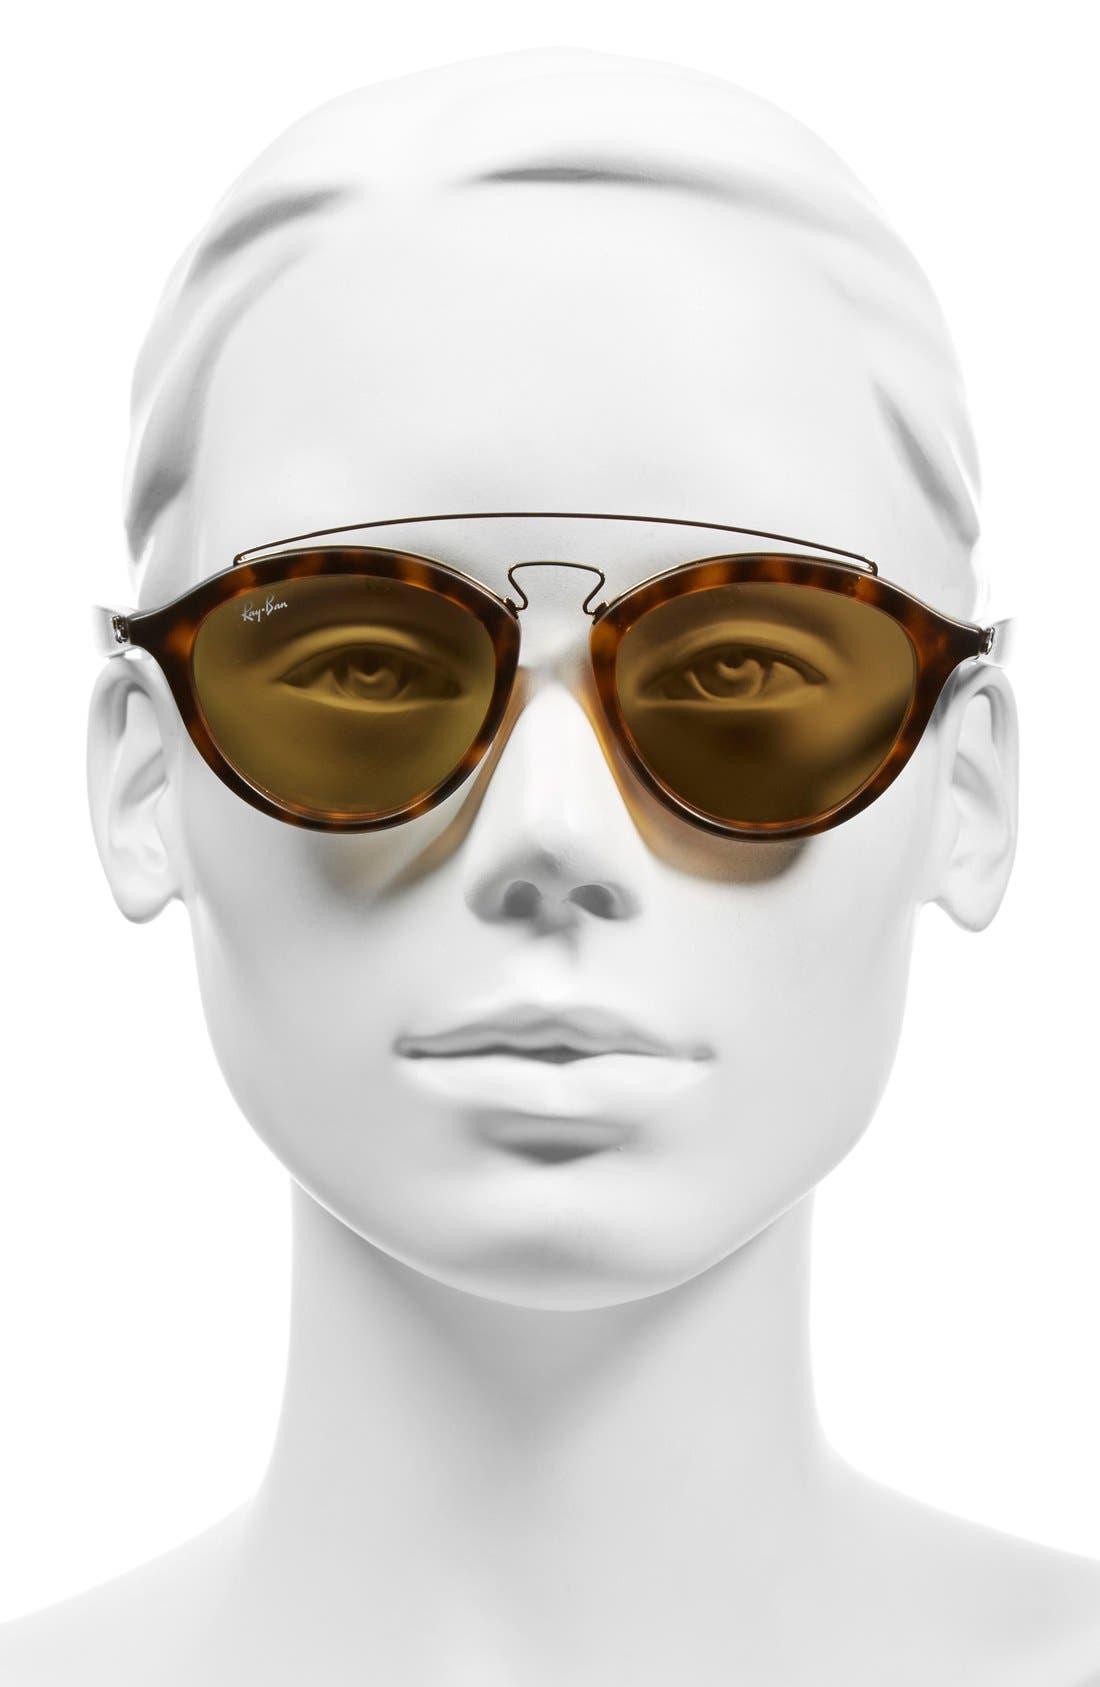 Highstreet 50mm Brow Bar Sunglasses,                             Alternate thumbnail 10, color,